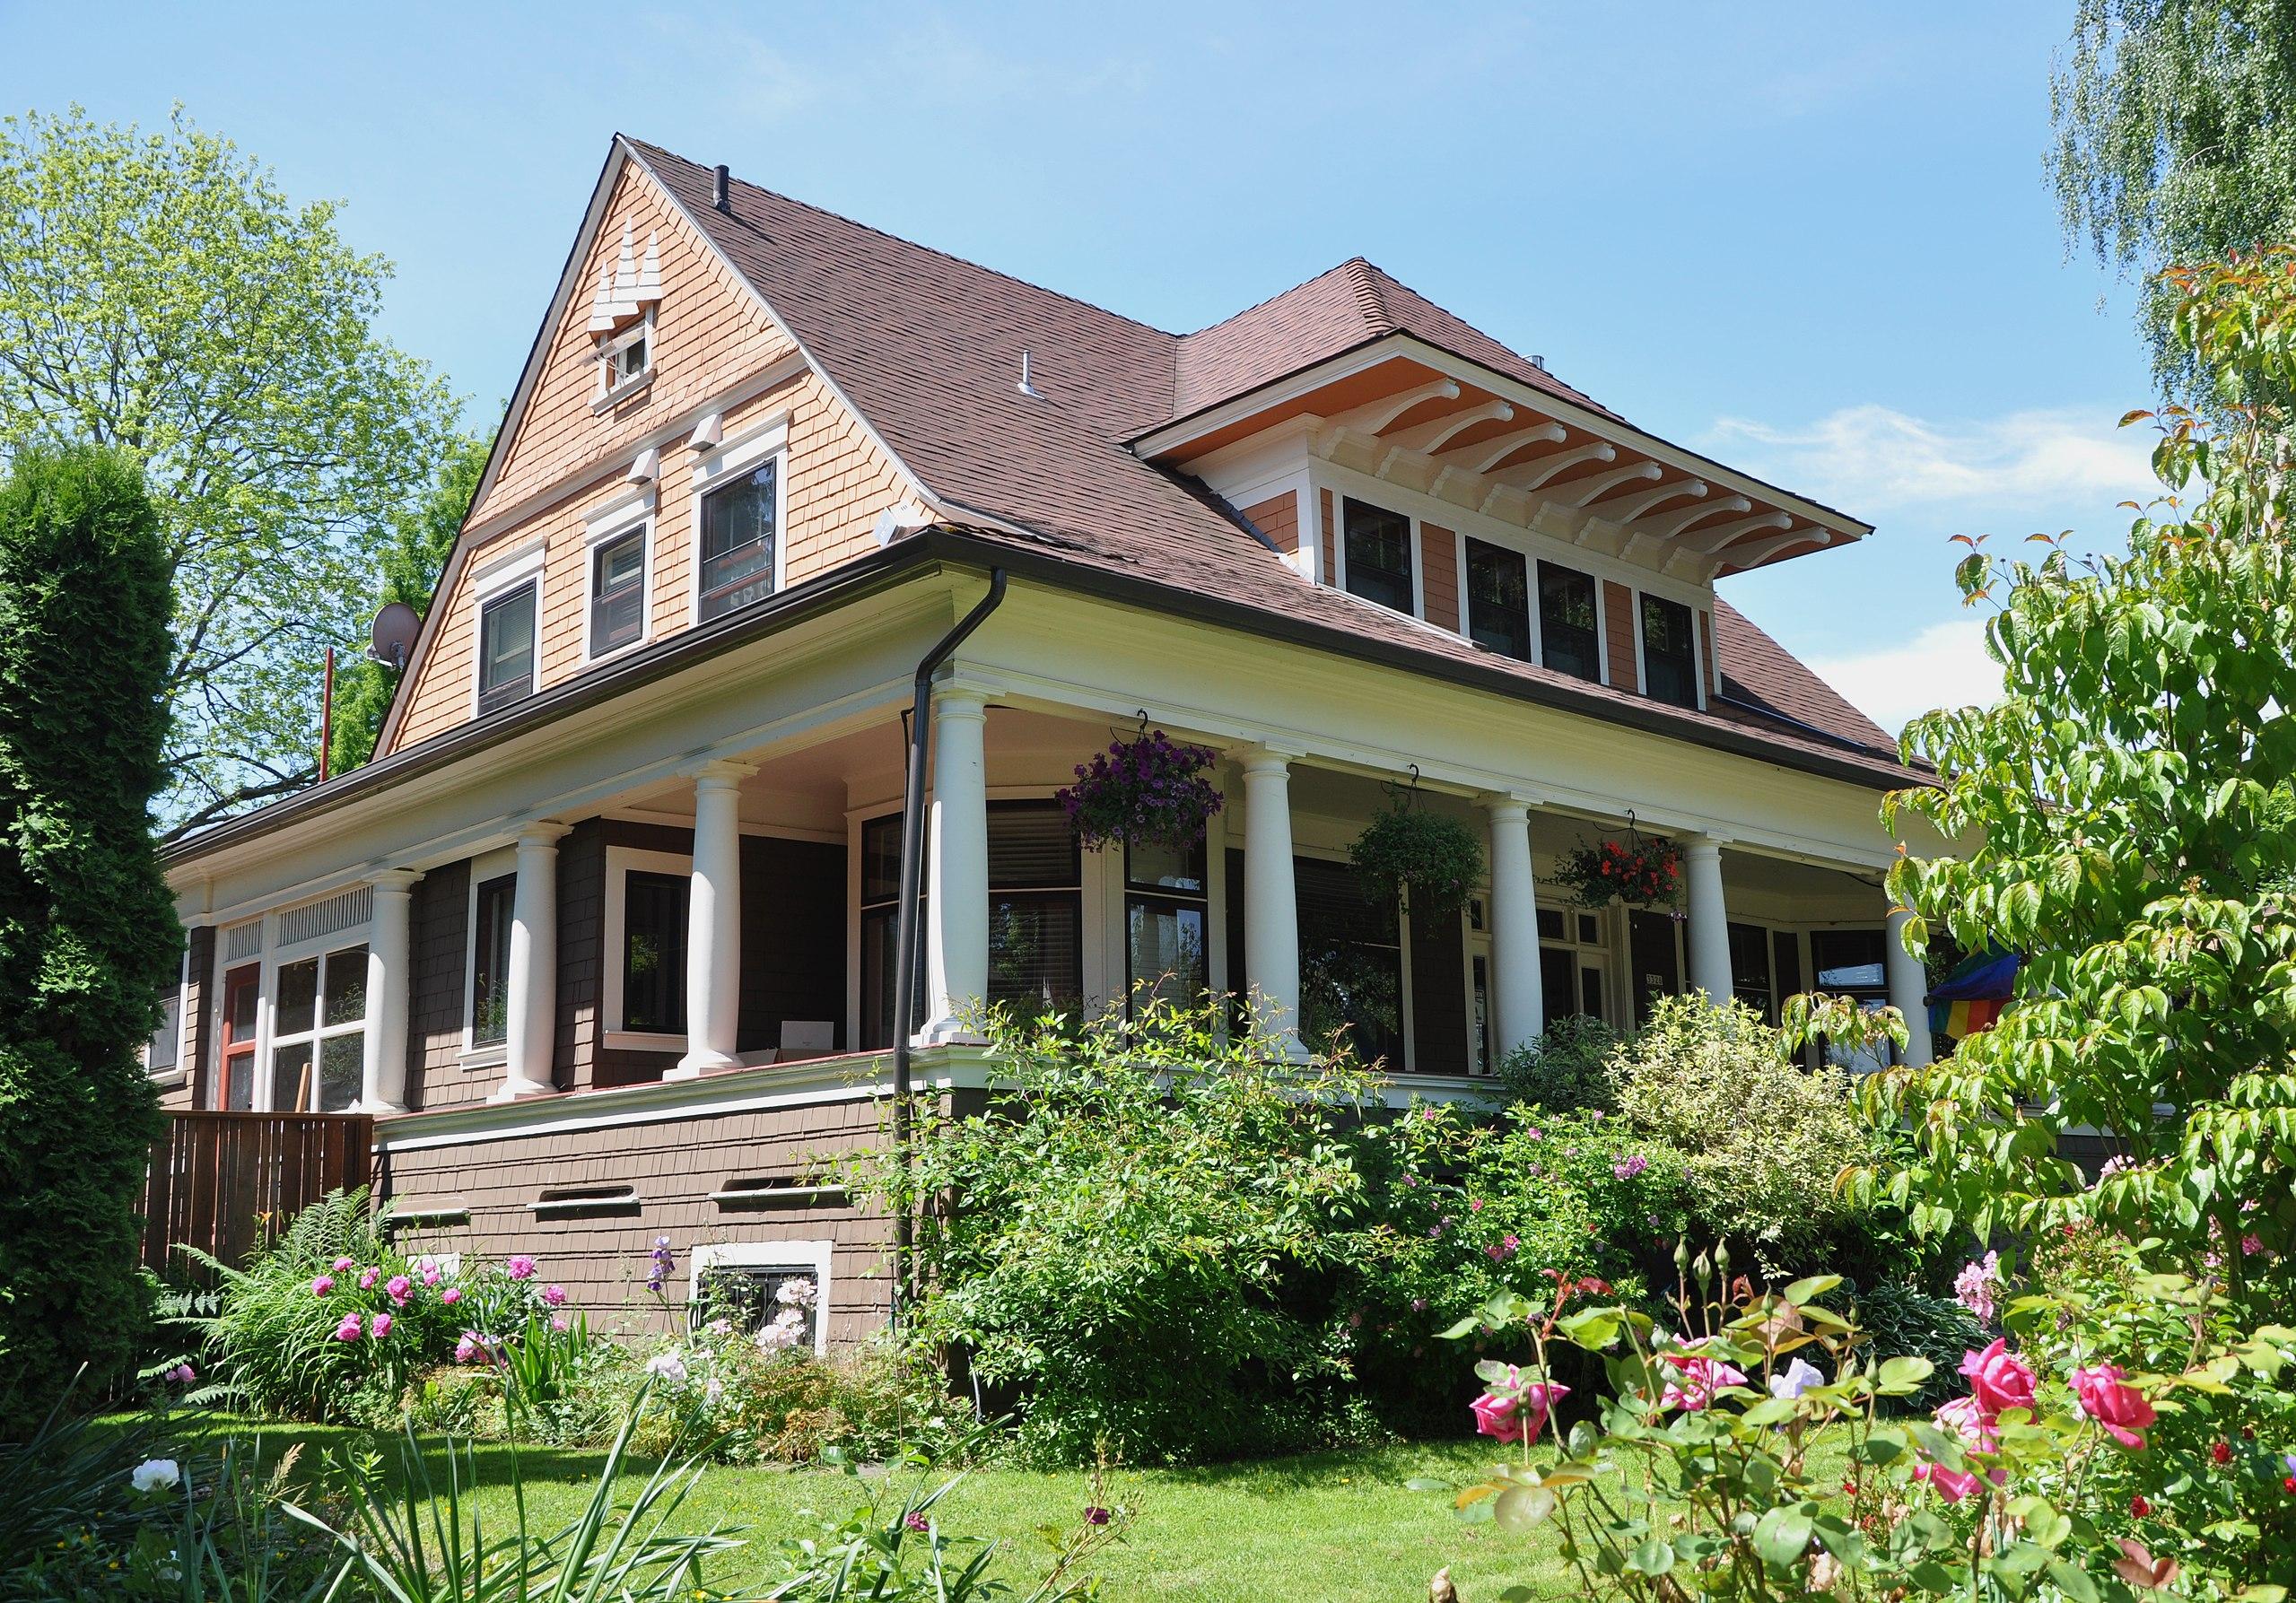 Edward D. Dupont House